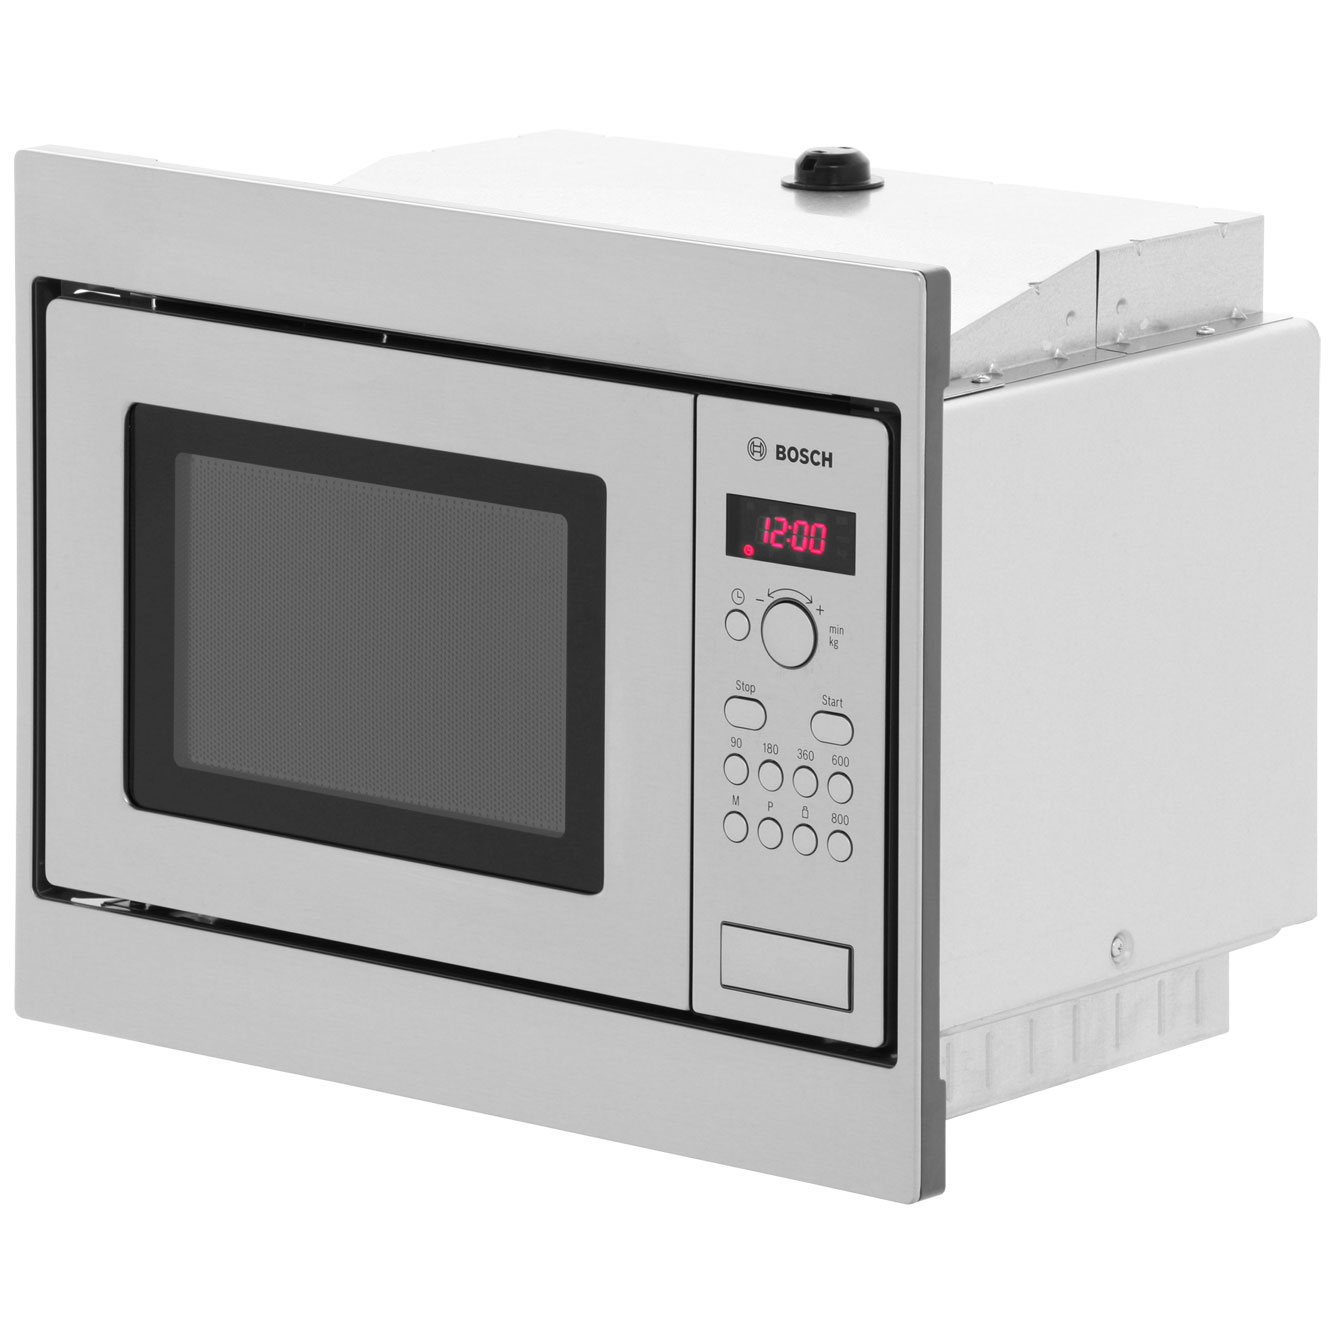 bosch innowave microwave instructions